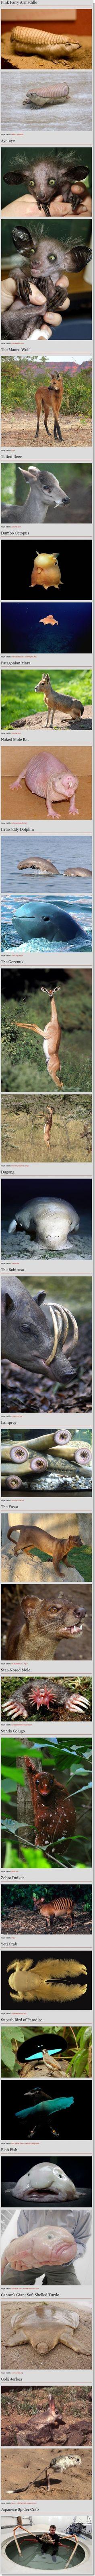 Just adding to my knowledge of strange animals :)